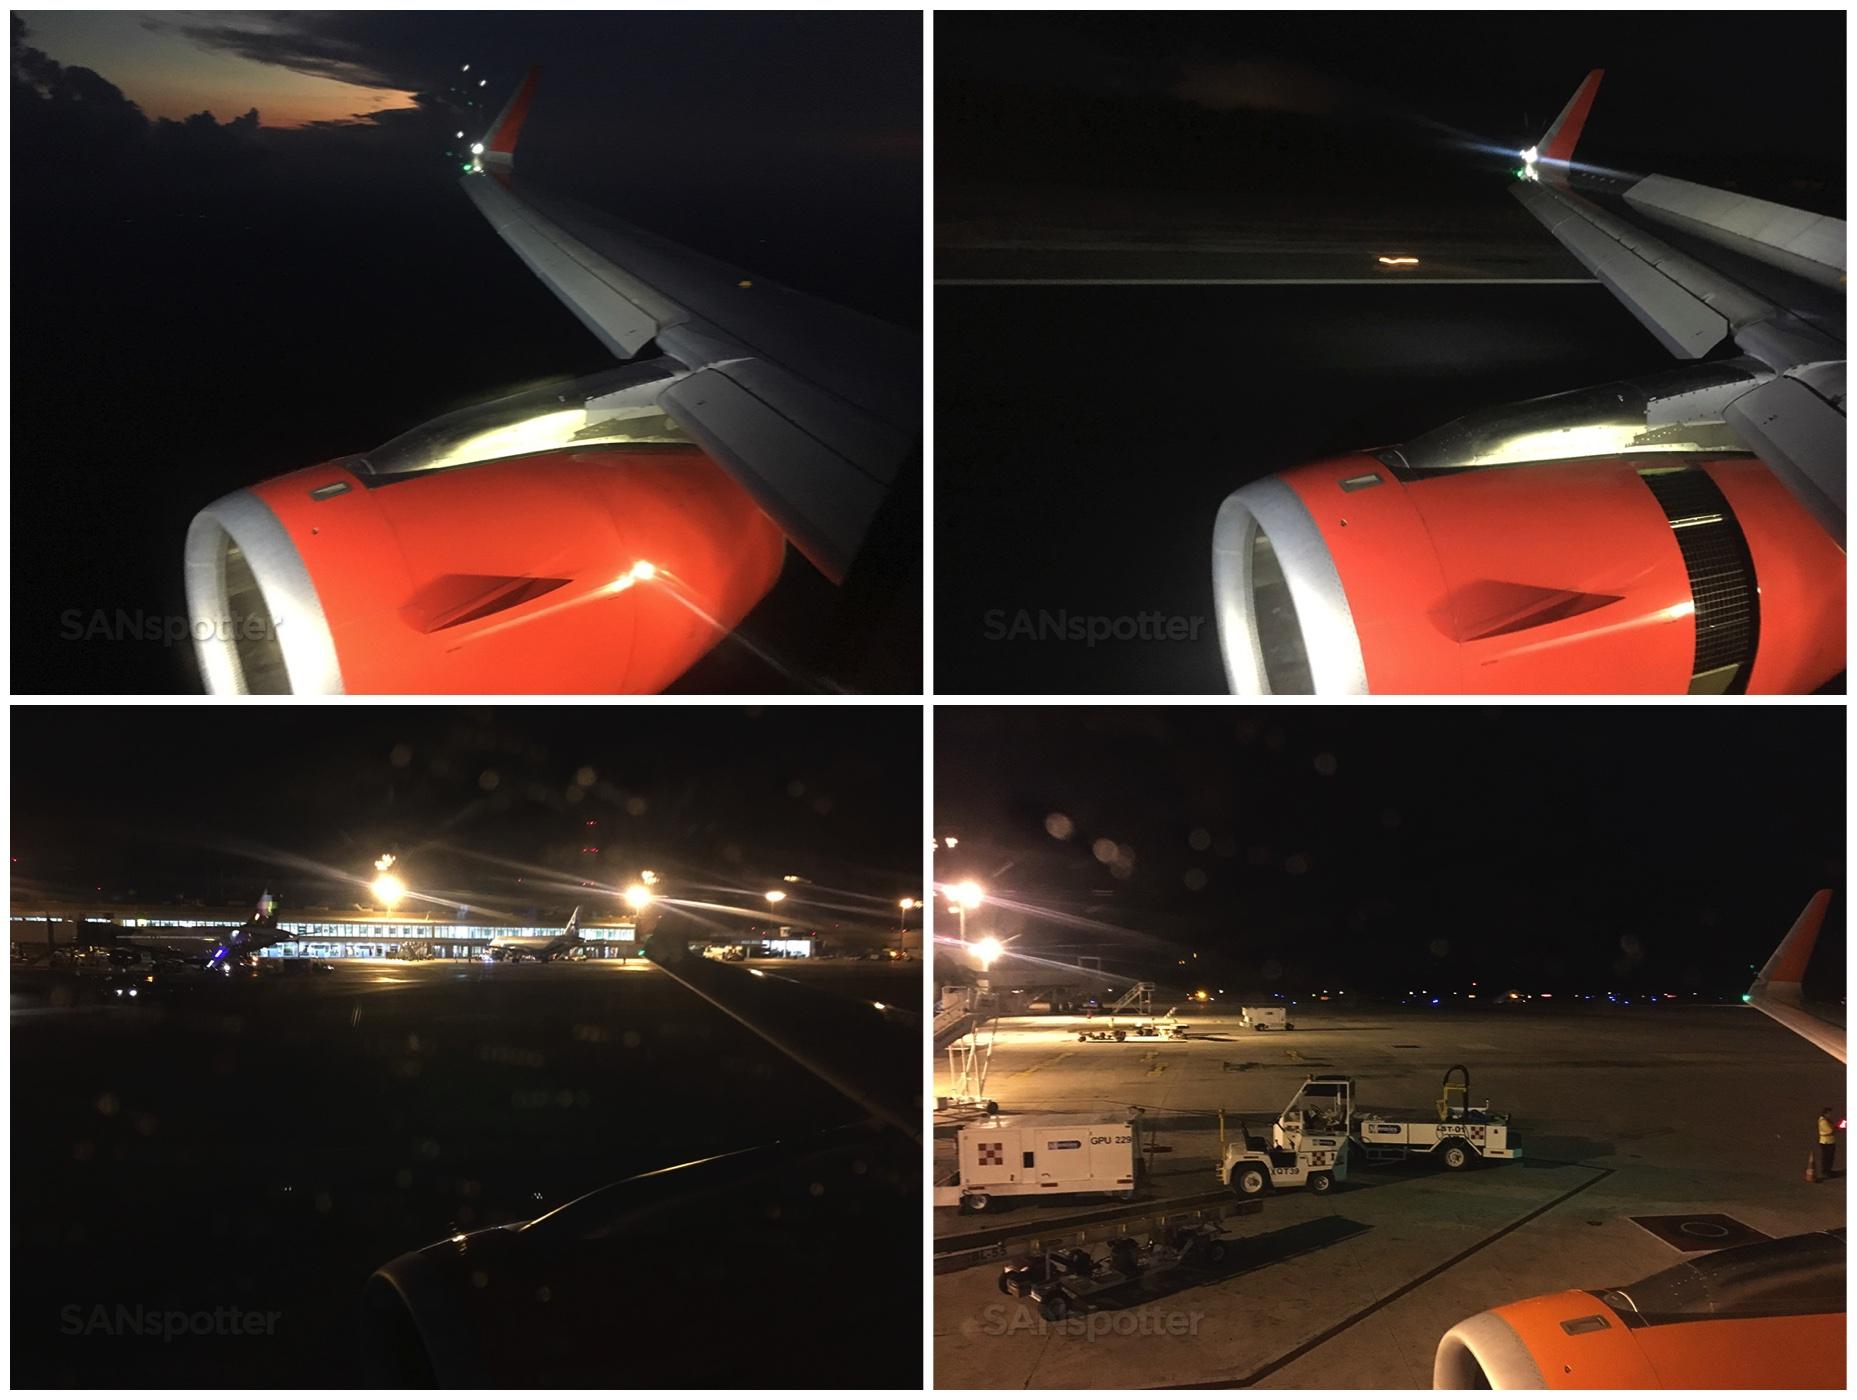 Landing Cancun airport